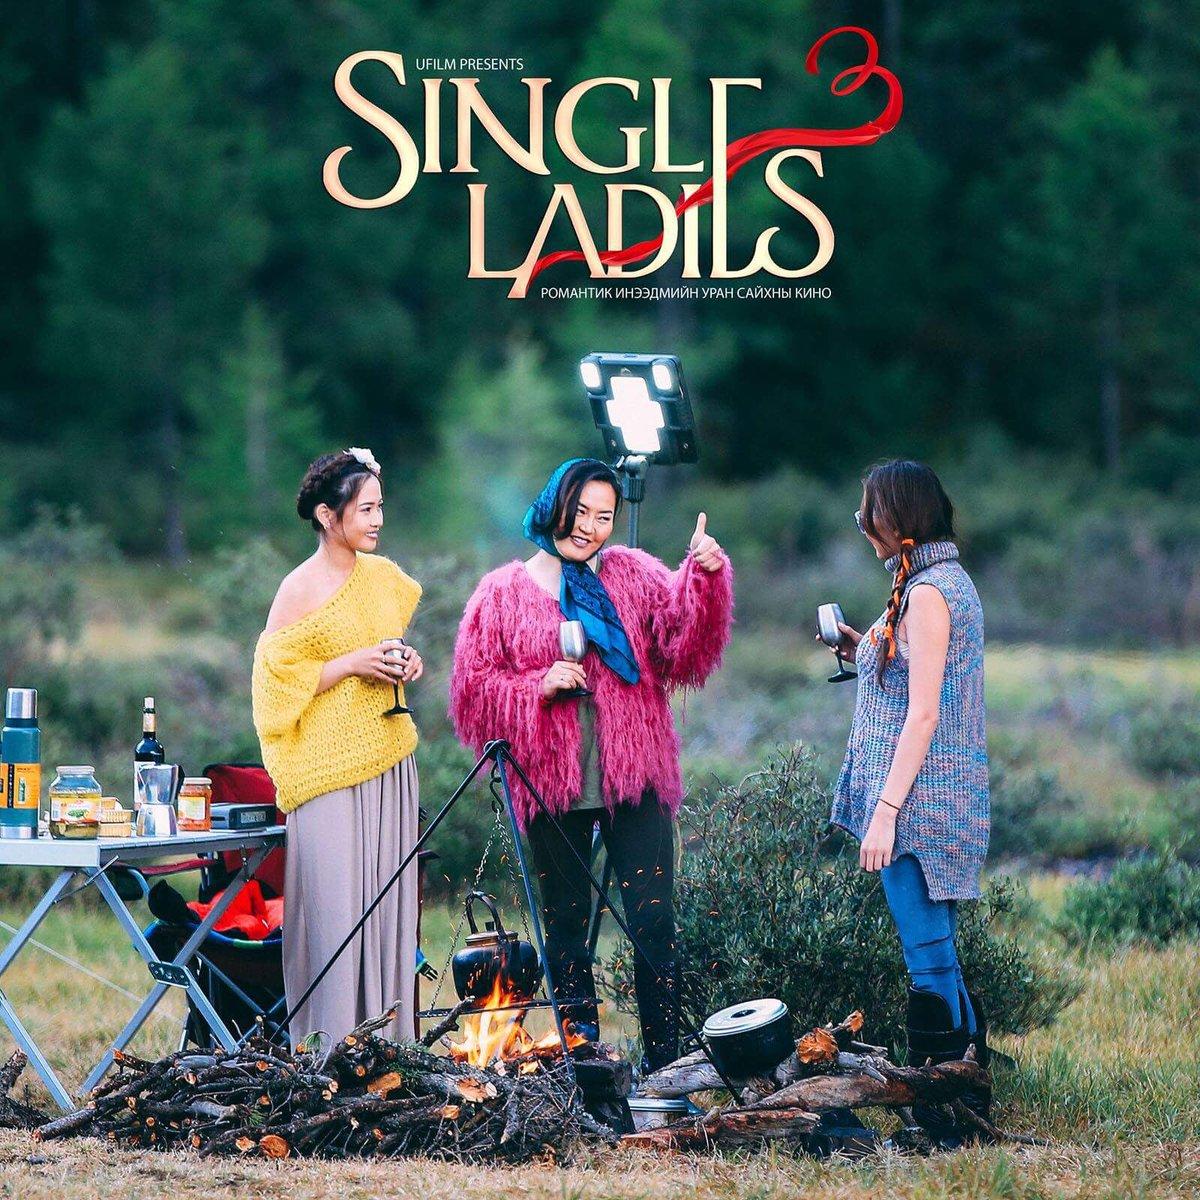 Single ladies youtube trailer home